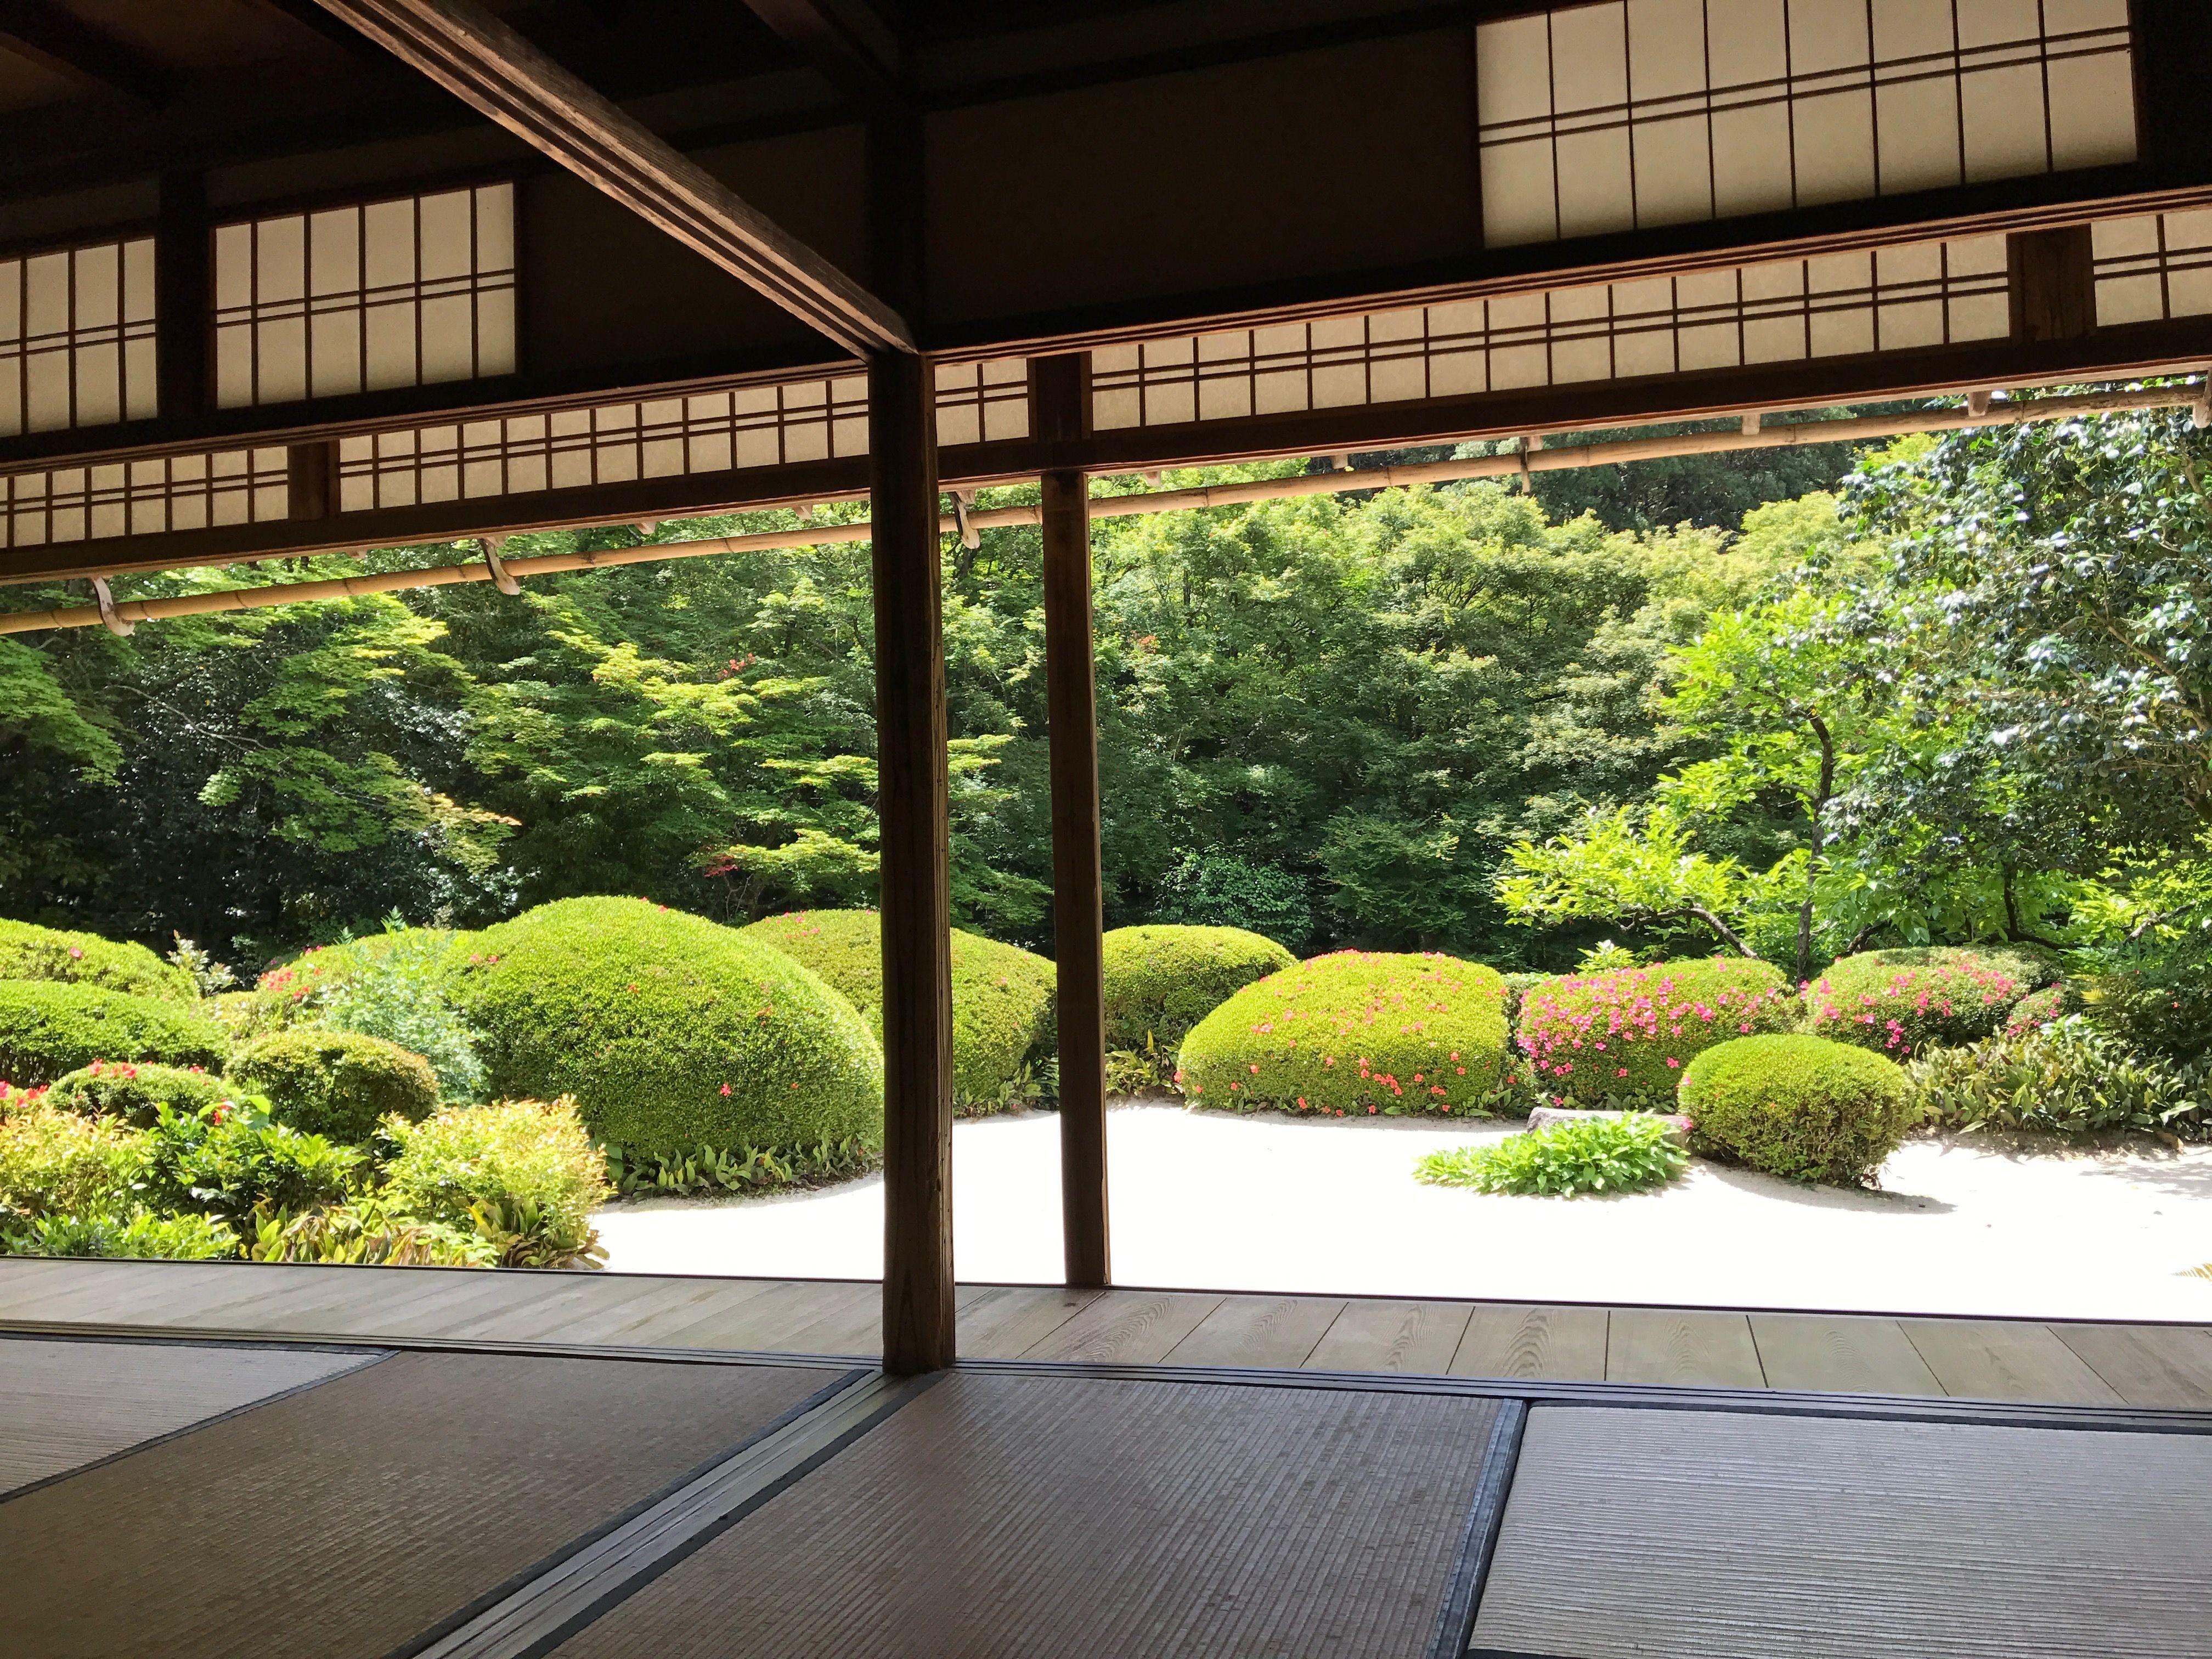 Pin by 宣仁 賴 on Landscape design elements Zen wallpaper